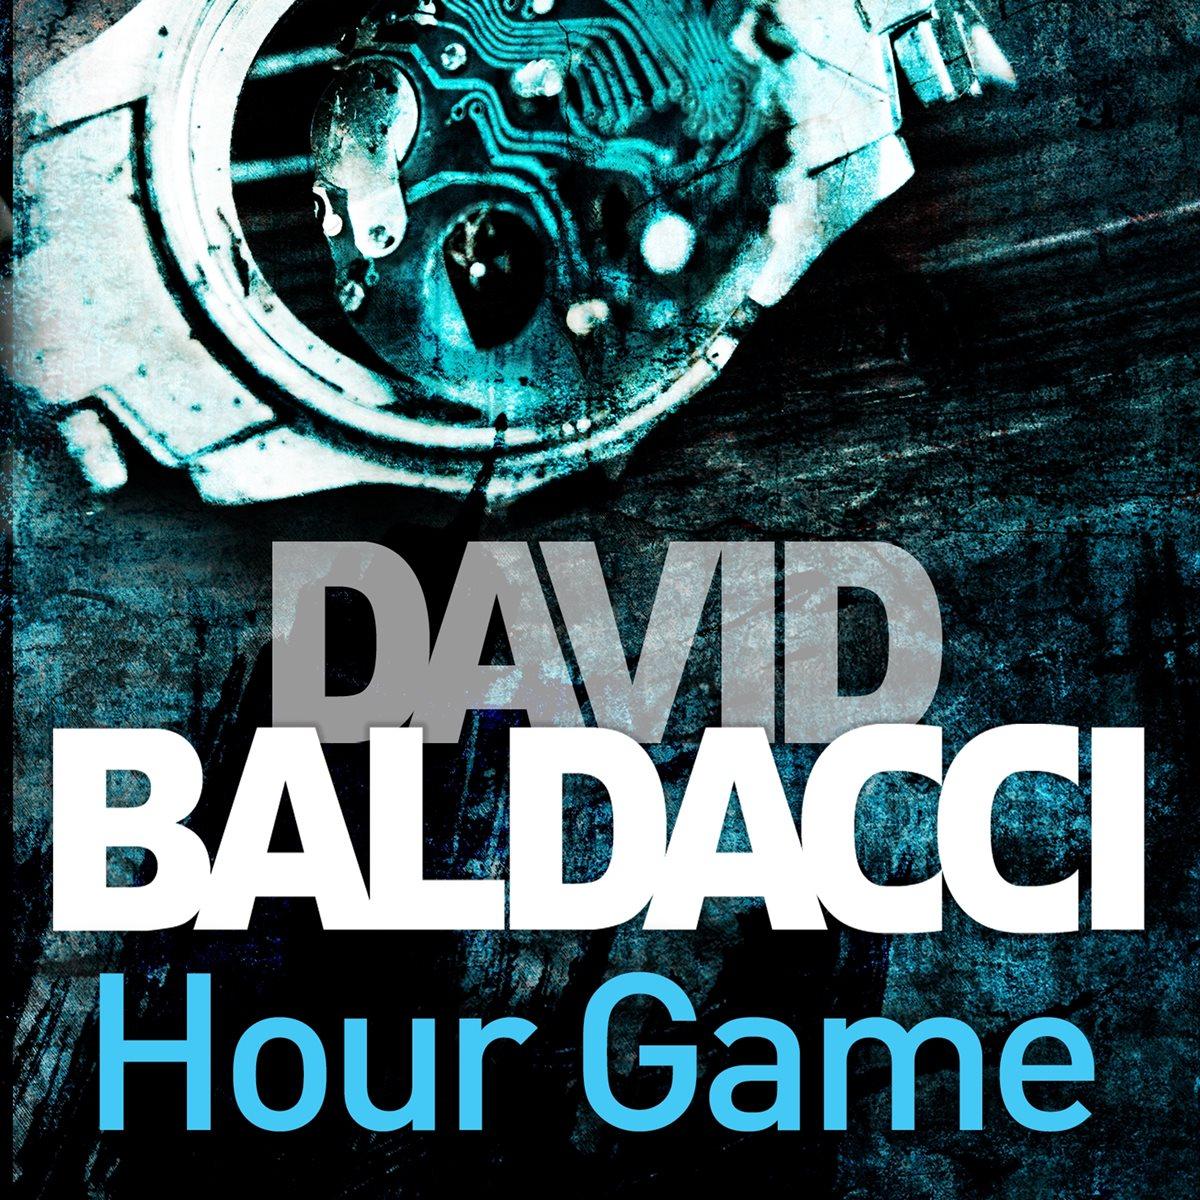 hour game david baldacci pdf